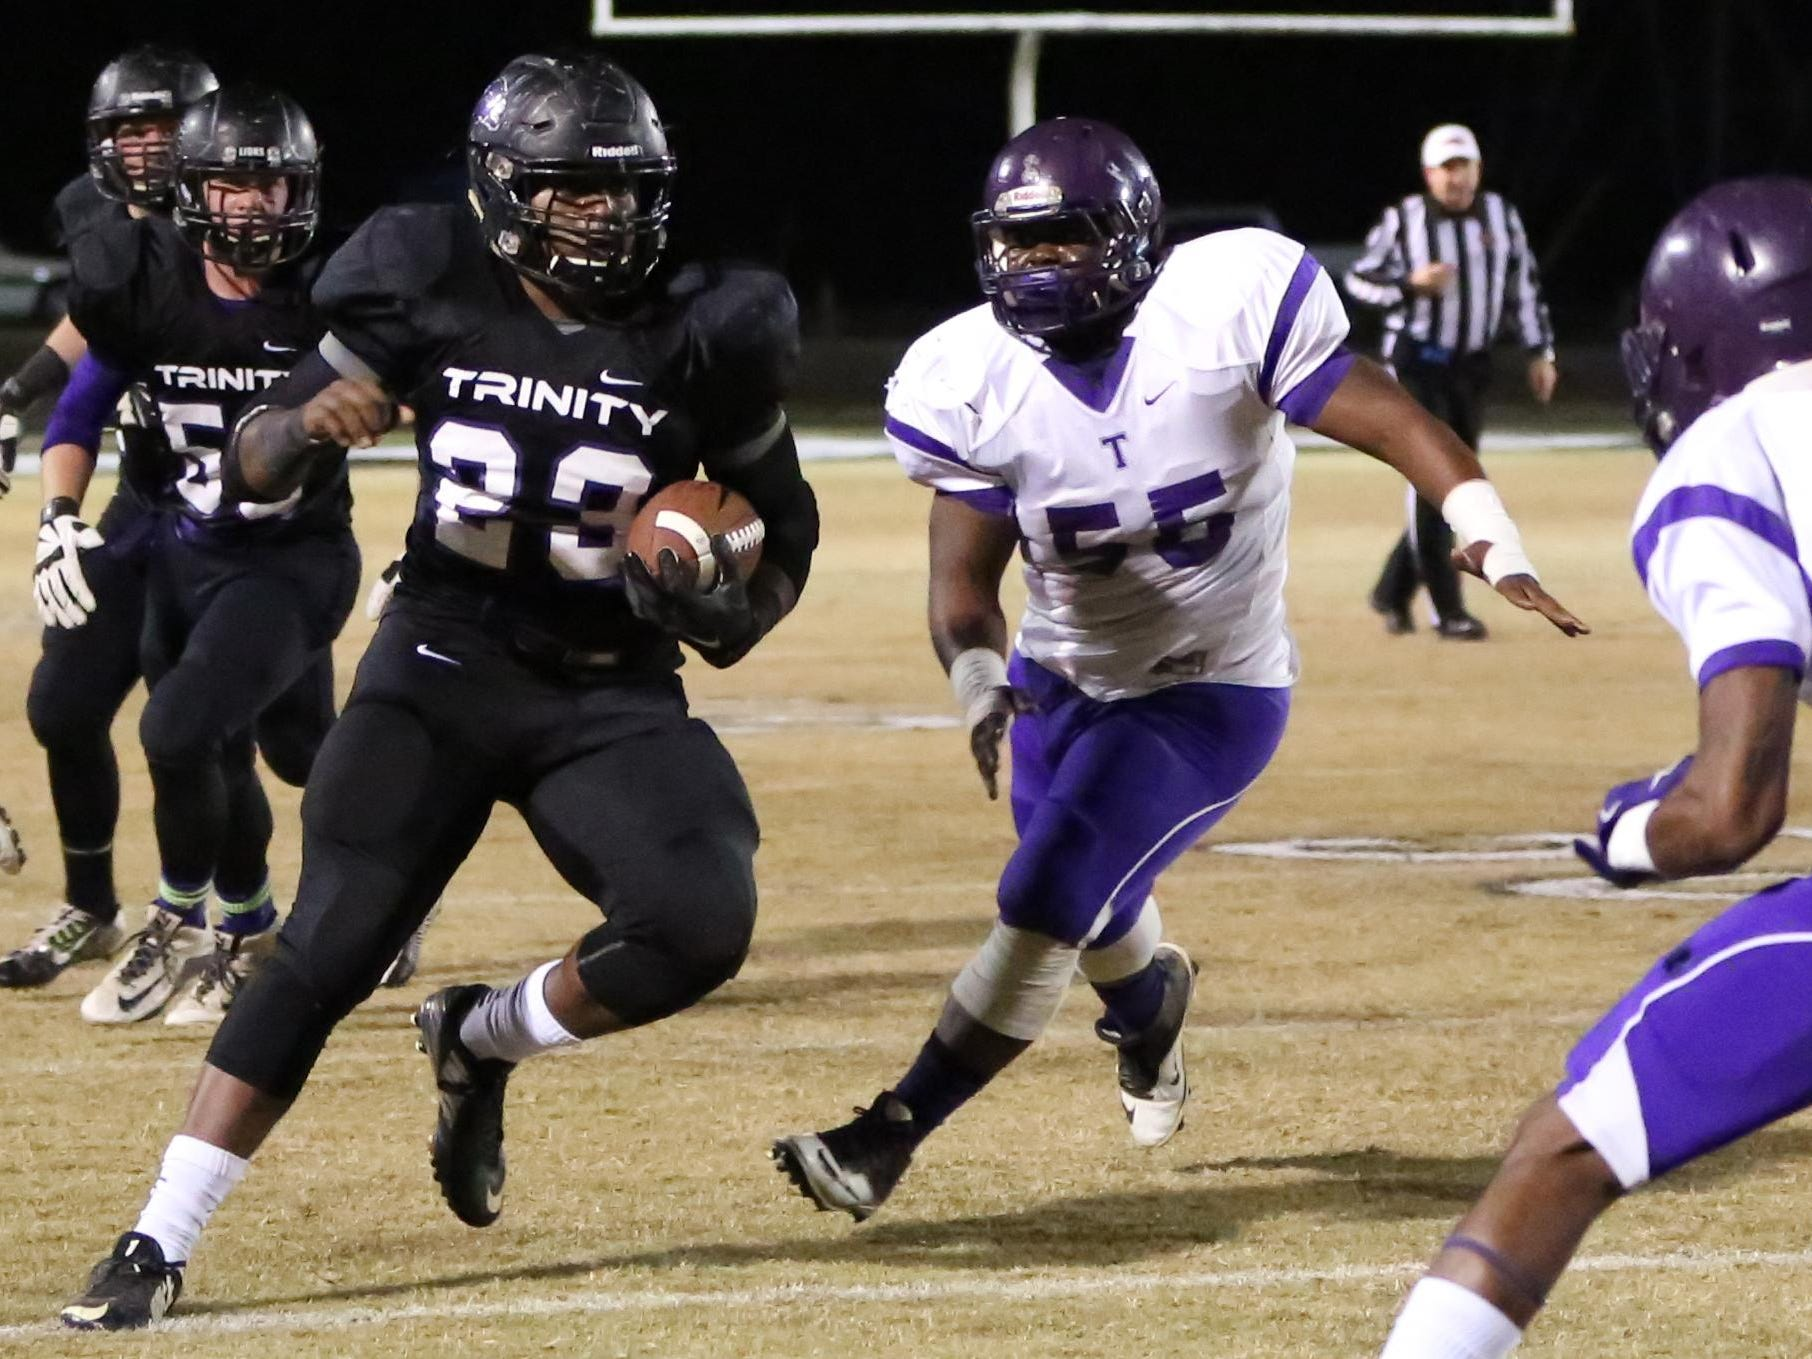 Trinity's Chris Tucker runs the ball against the Memphis Trezevant defense in Friday's Class 2A semifinal in Jackson.